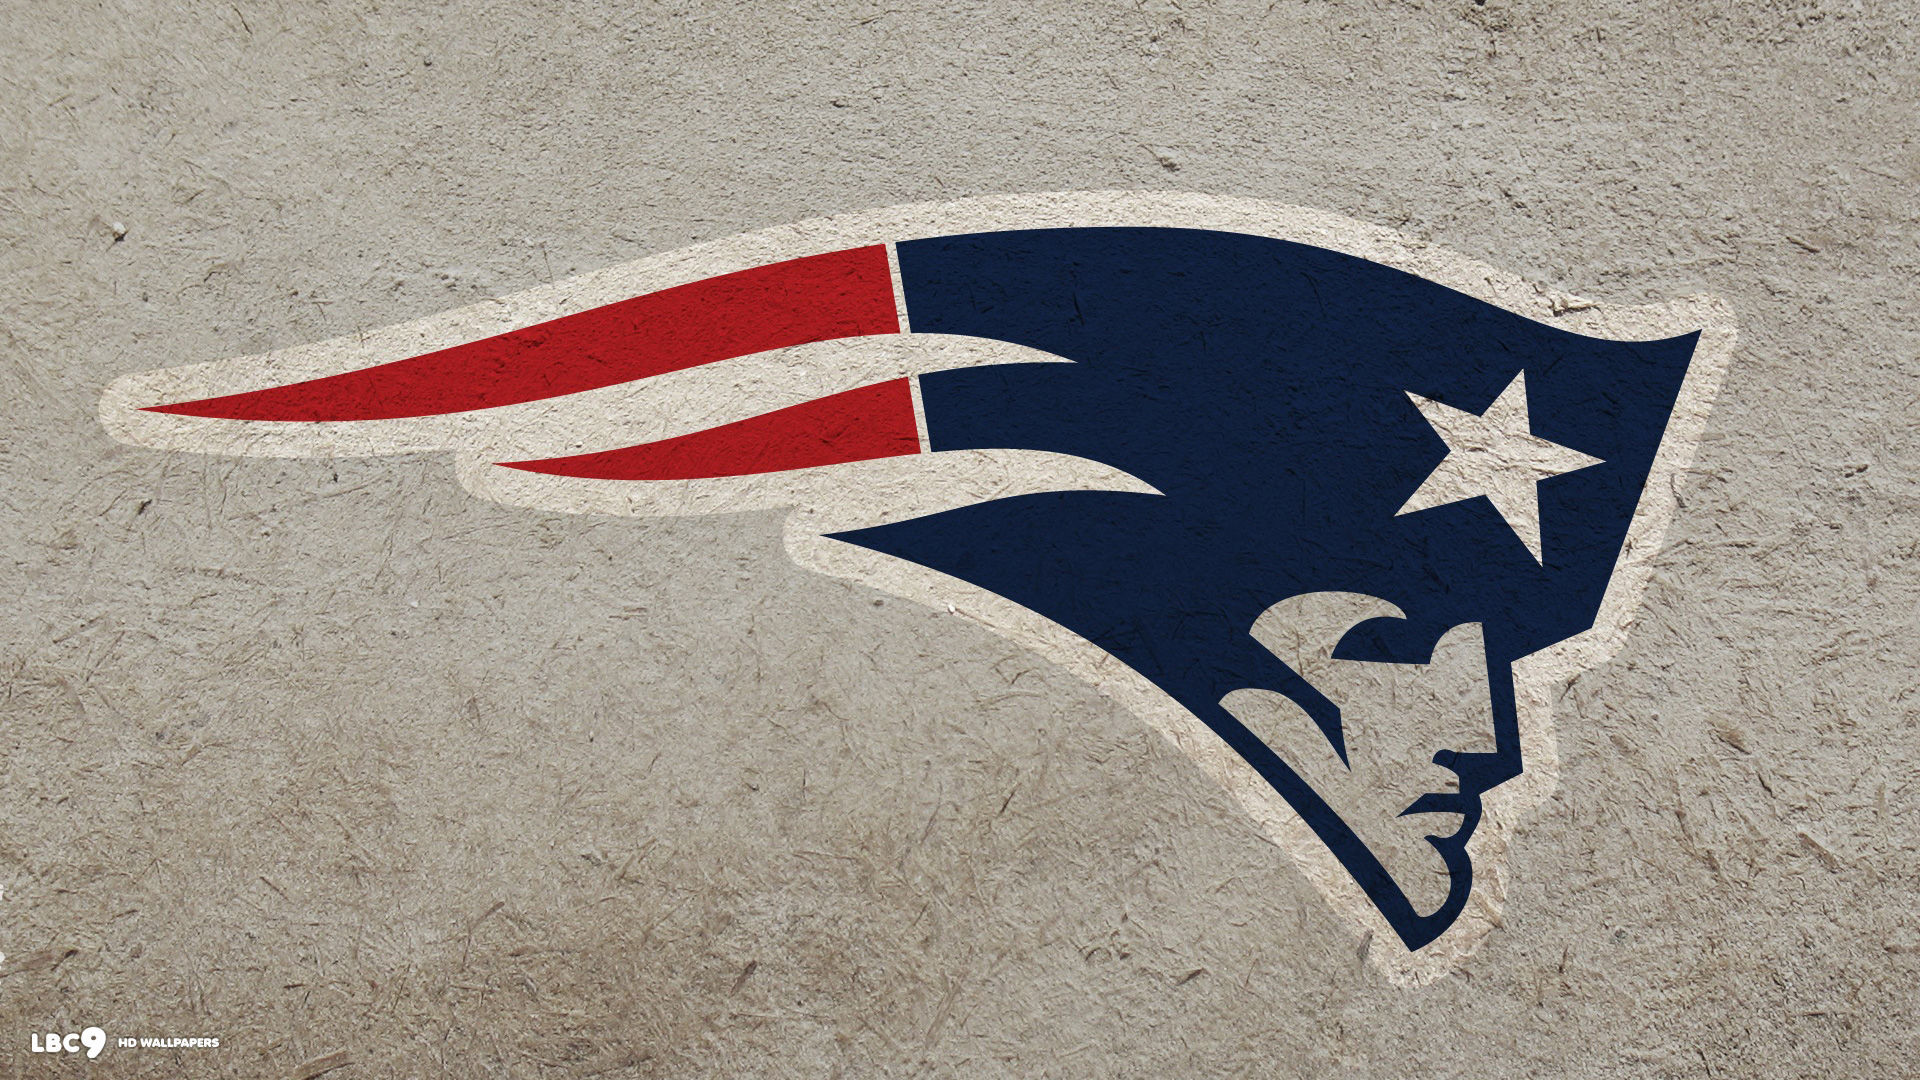 Tom Brady Wallpaper Iphone 7 New England Patriots Screensaver Wallpaper 68 Images